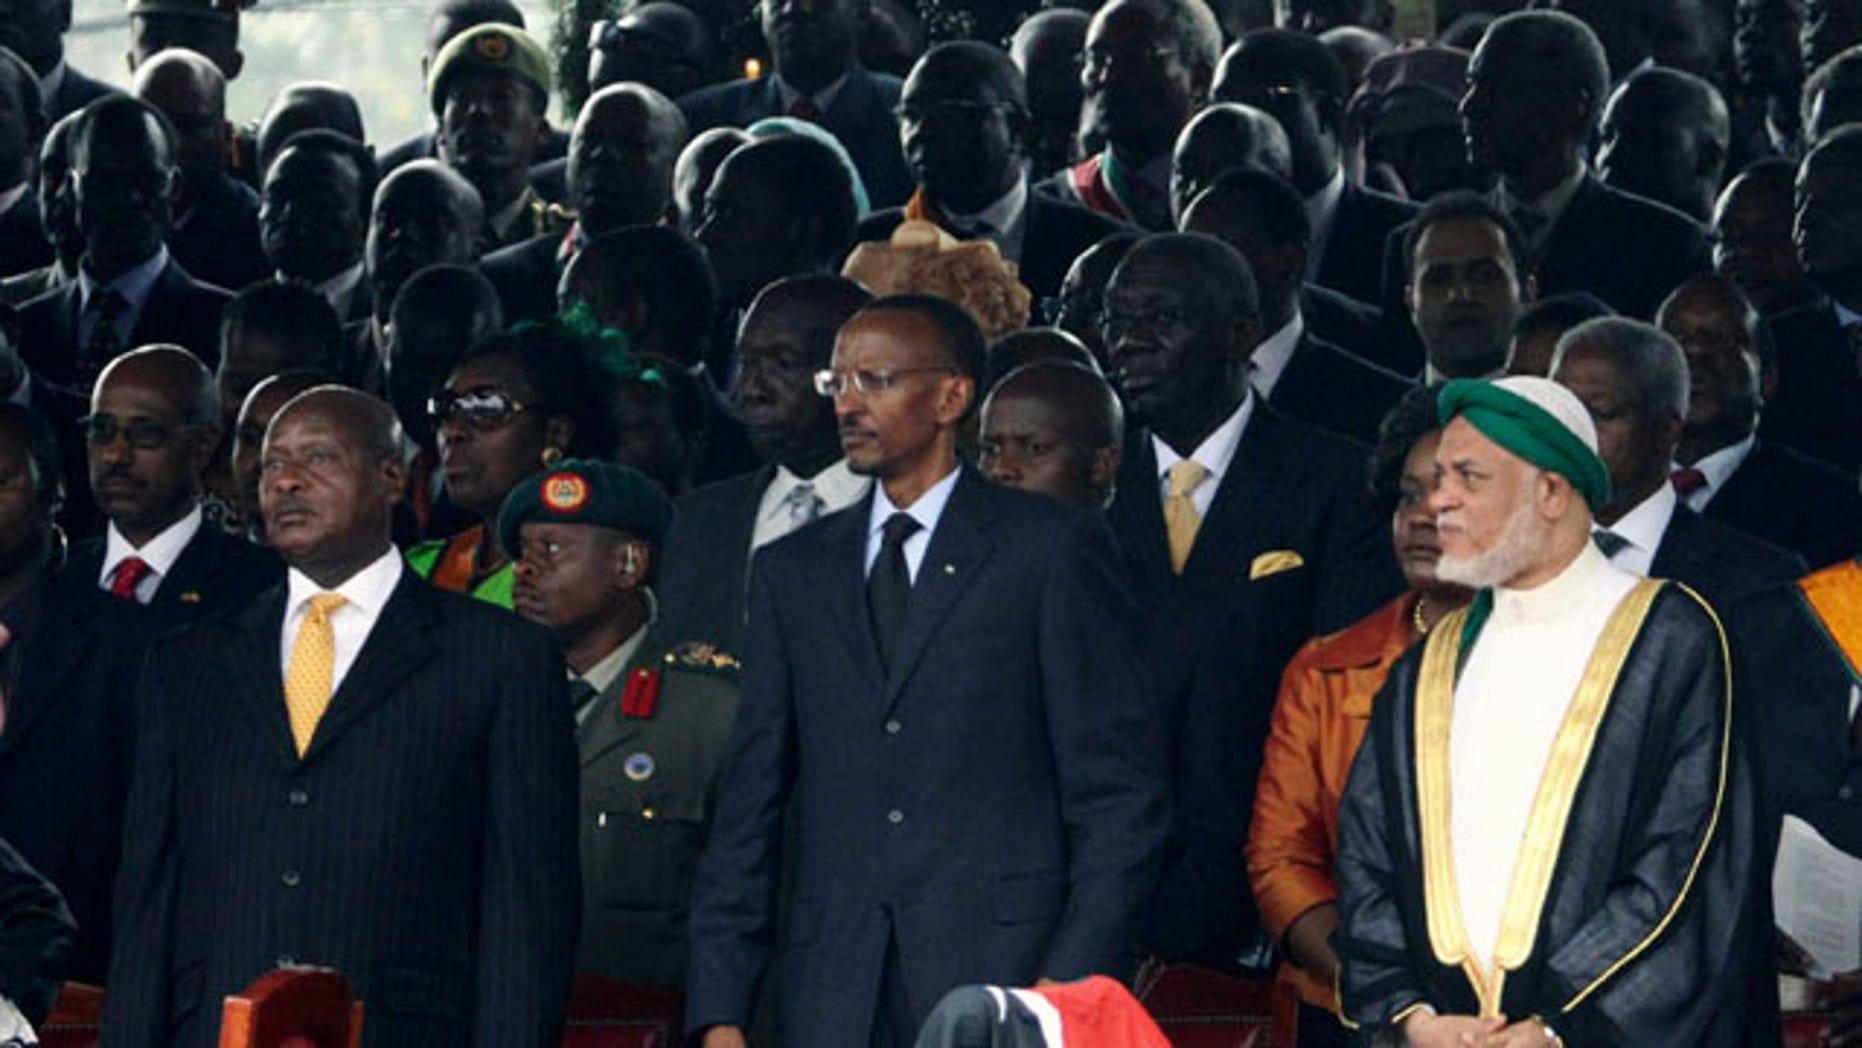 August 27: Ugandan President Yoweri Museveni, Rwandan President Paul Kagame, Comoros President Ahmed Abdallah Mohamed Sambi, and Sudan President Omar Al Bashir, attend the signing into law of the new Kenyan constitution, at Uhuru Park in Nairobi, Kenya. (AP)